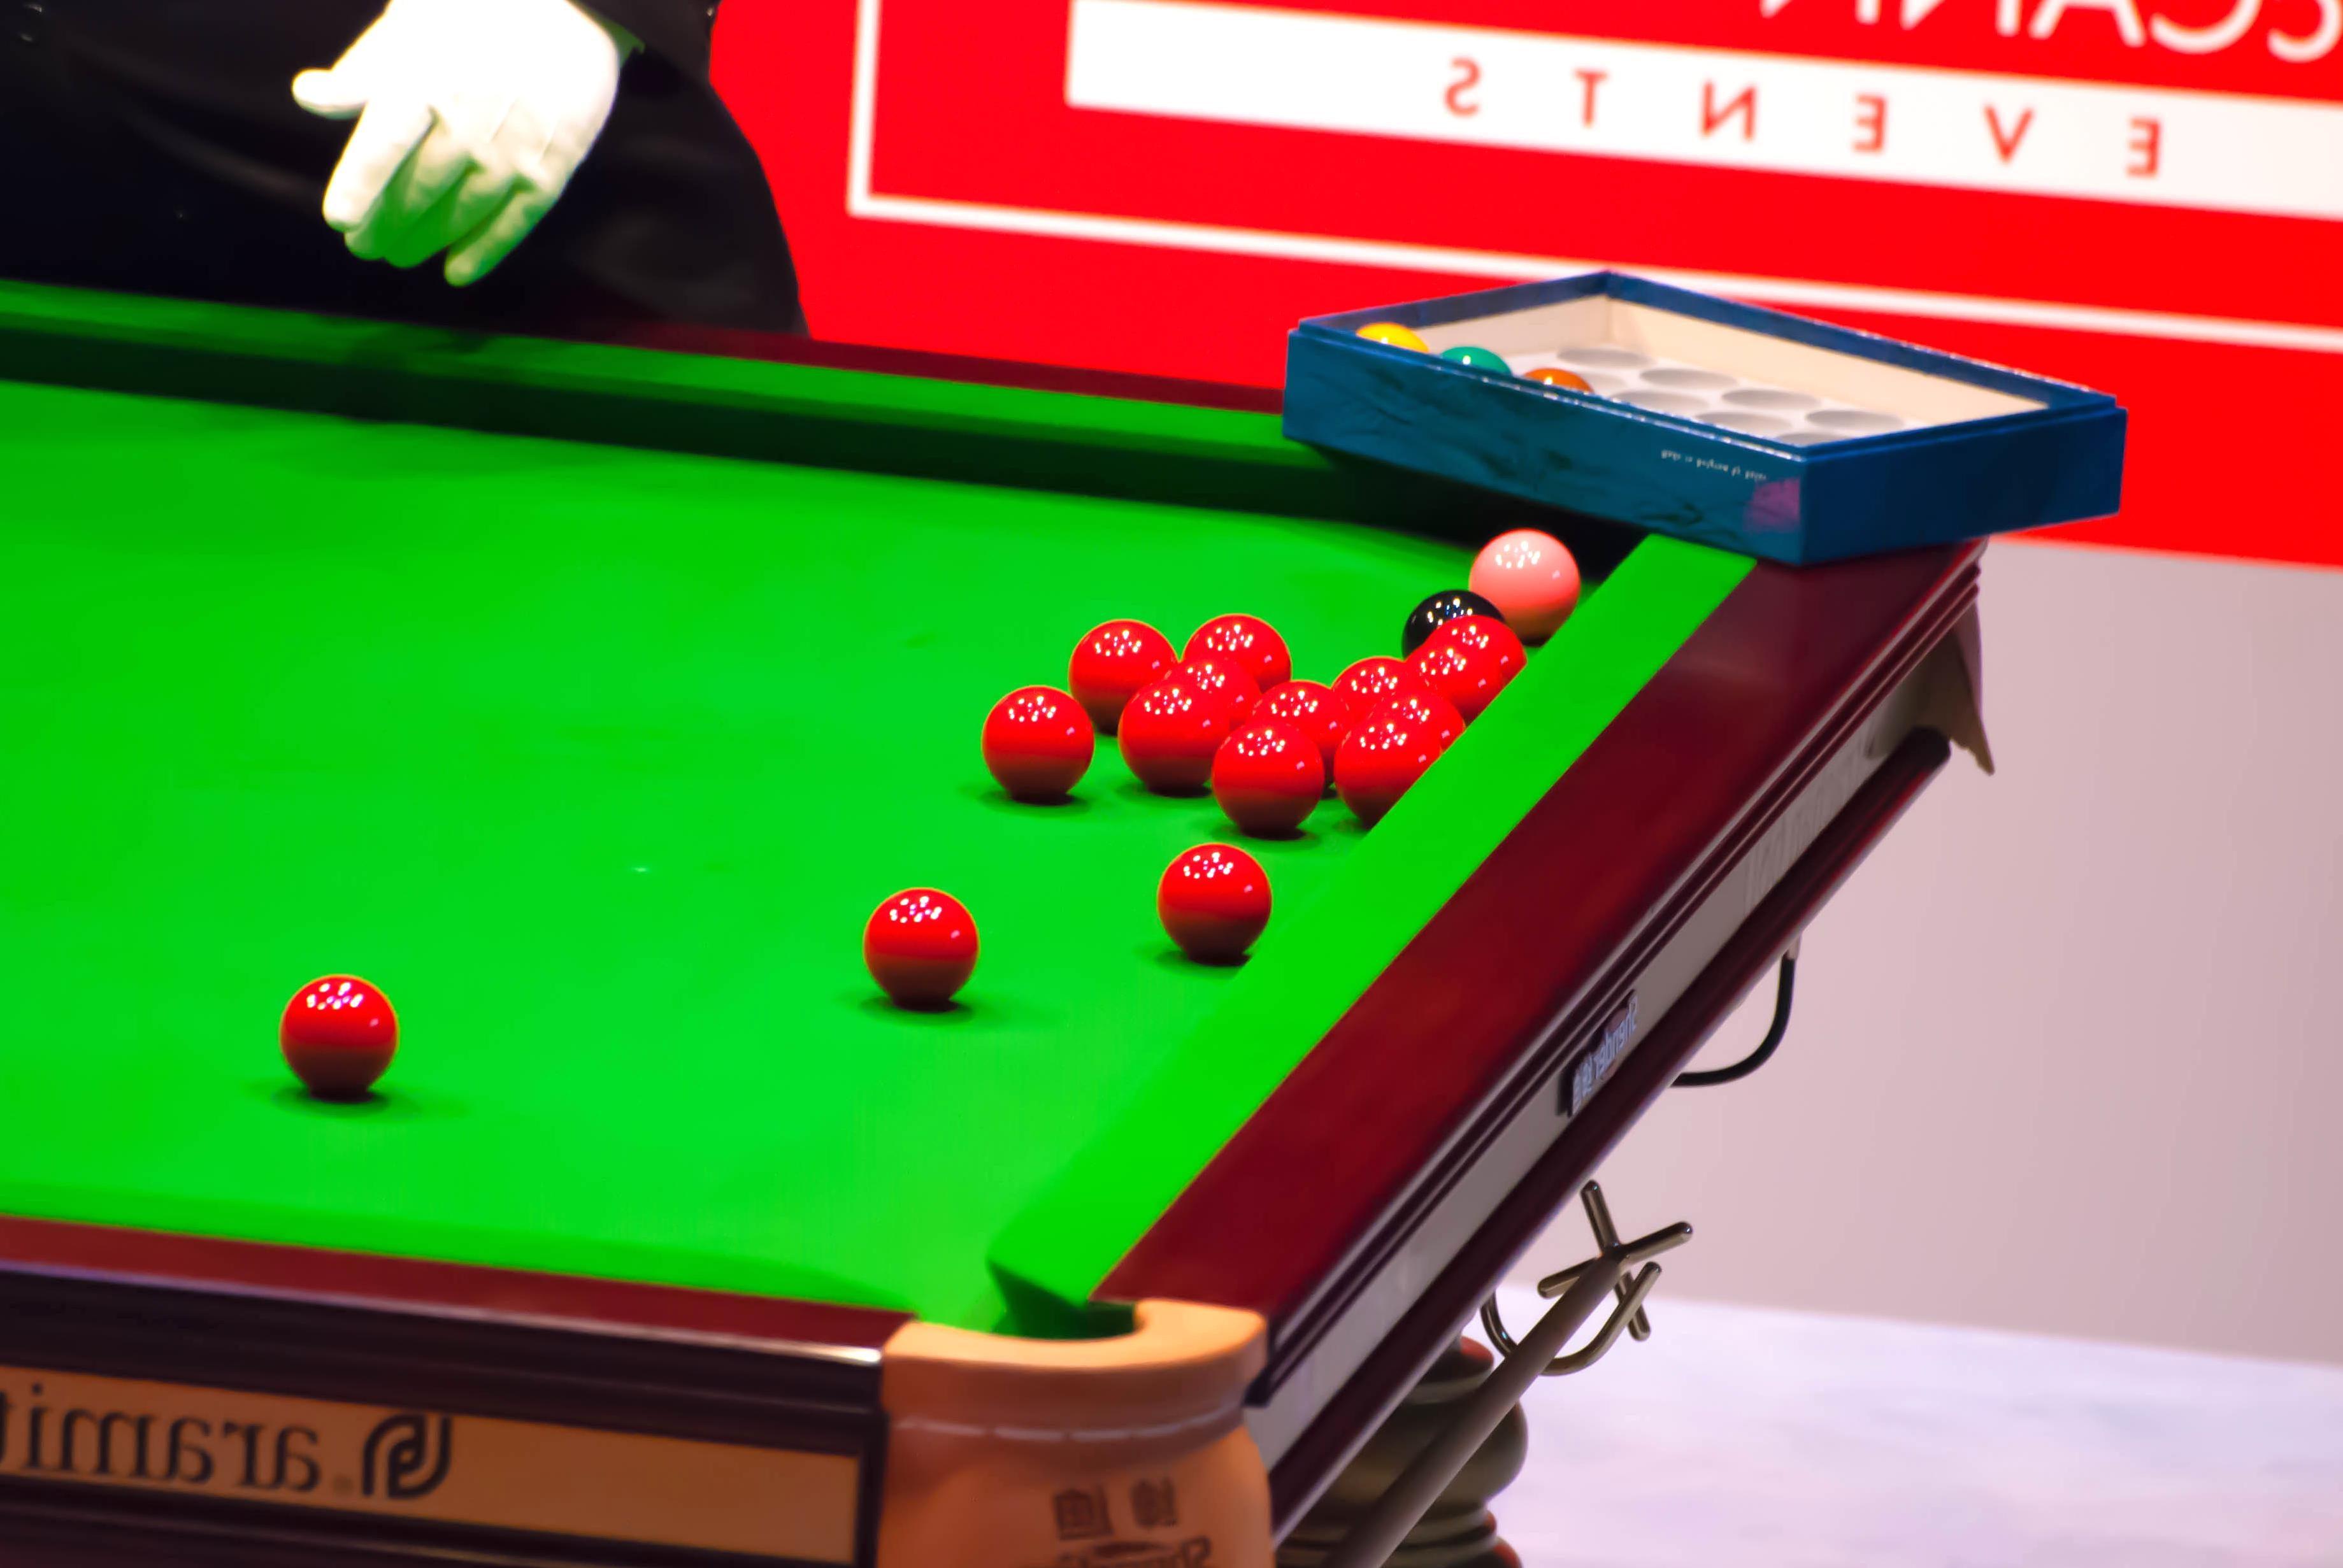 Imagen gratis: Billar, snooker, juego, deporte, mesa ...